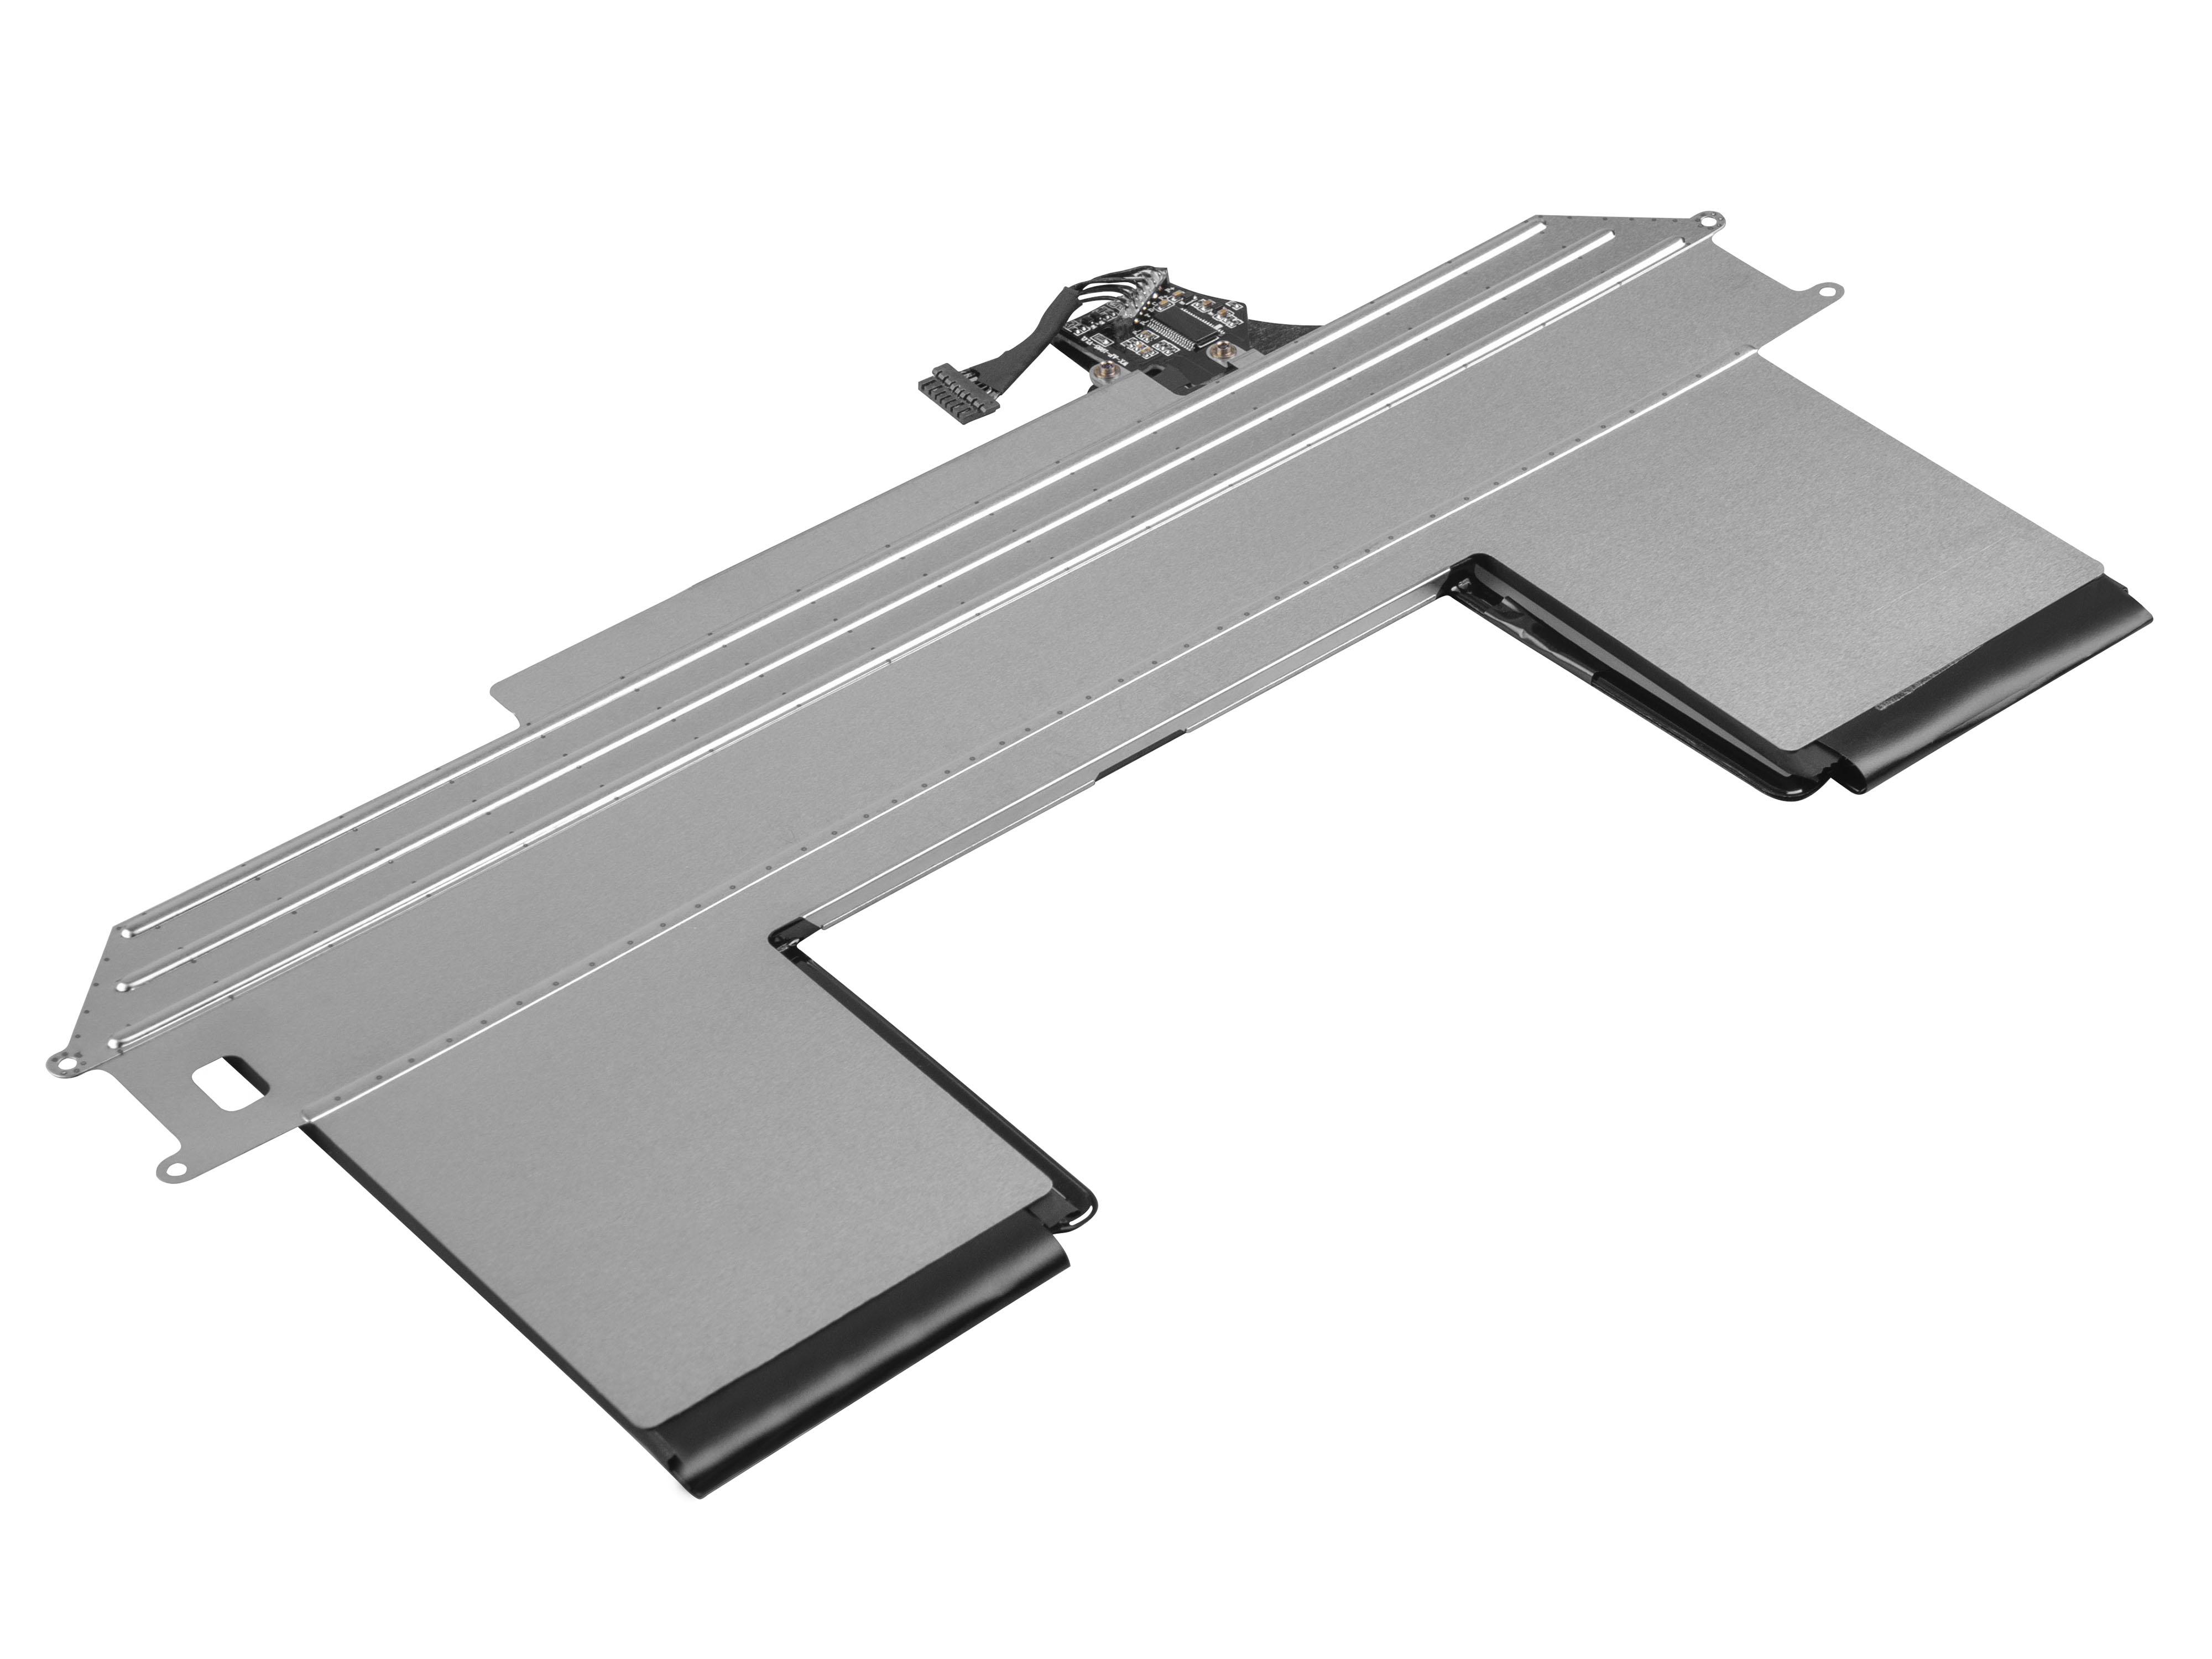 A1965 battery for Apple MacBook Air 13 A1932 A2179 (2018, 2019, 2020)